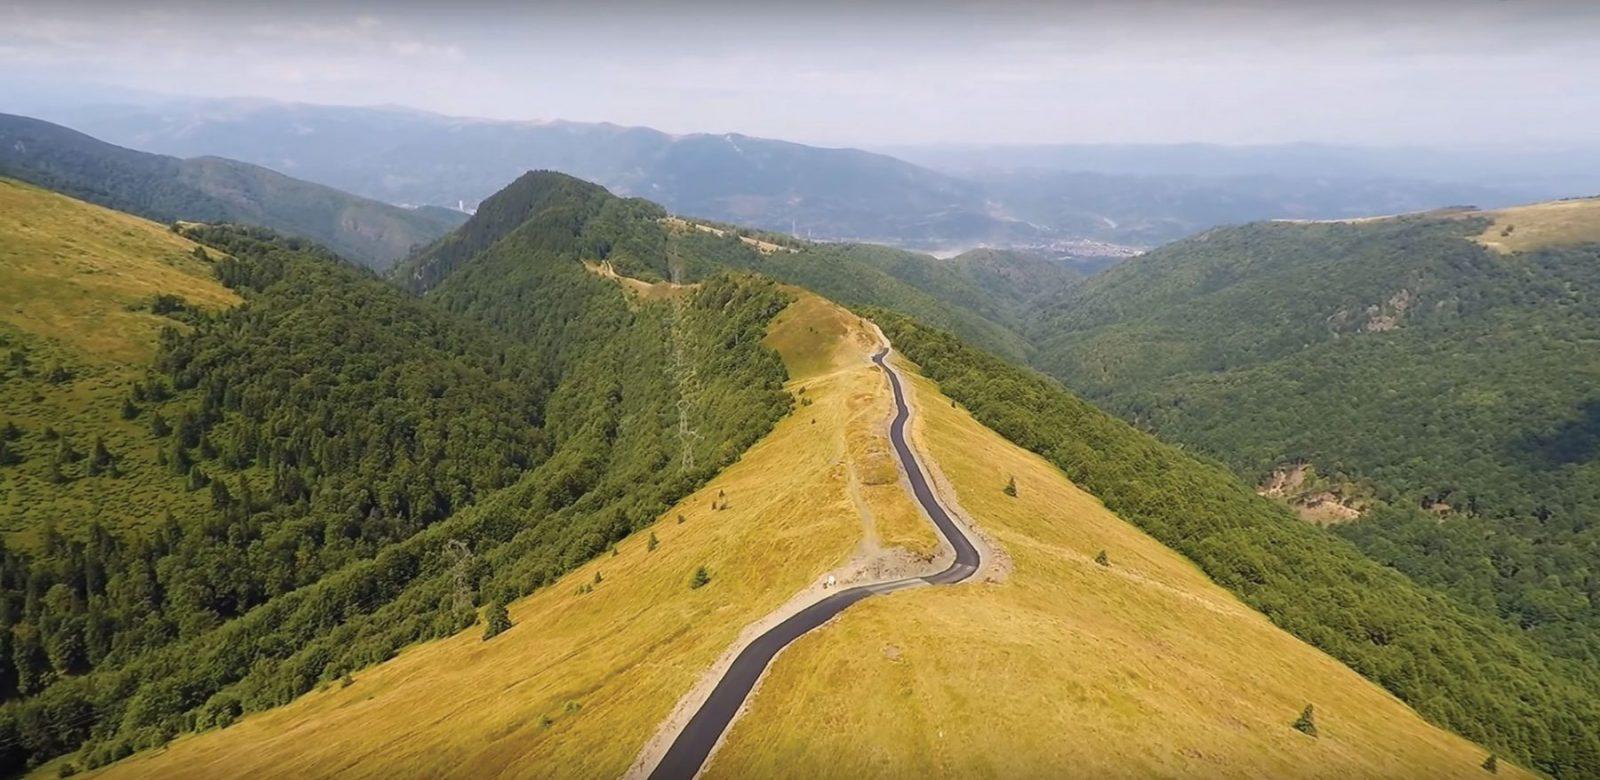 Transvilcan - в Румъния изграждат нов панорамен път по подобие на Transalpina и Transfagarasan